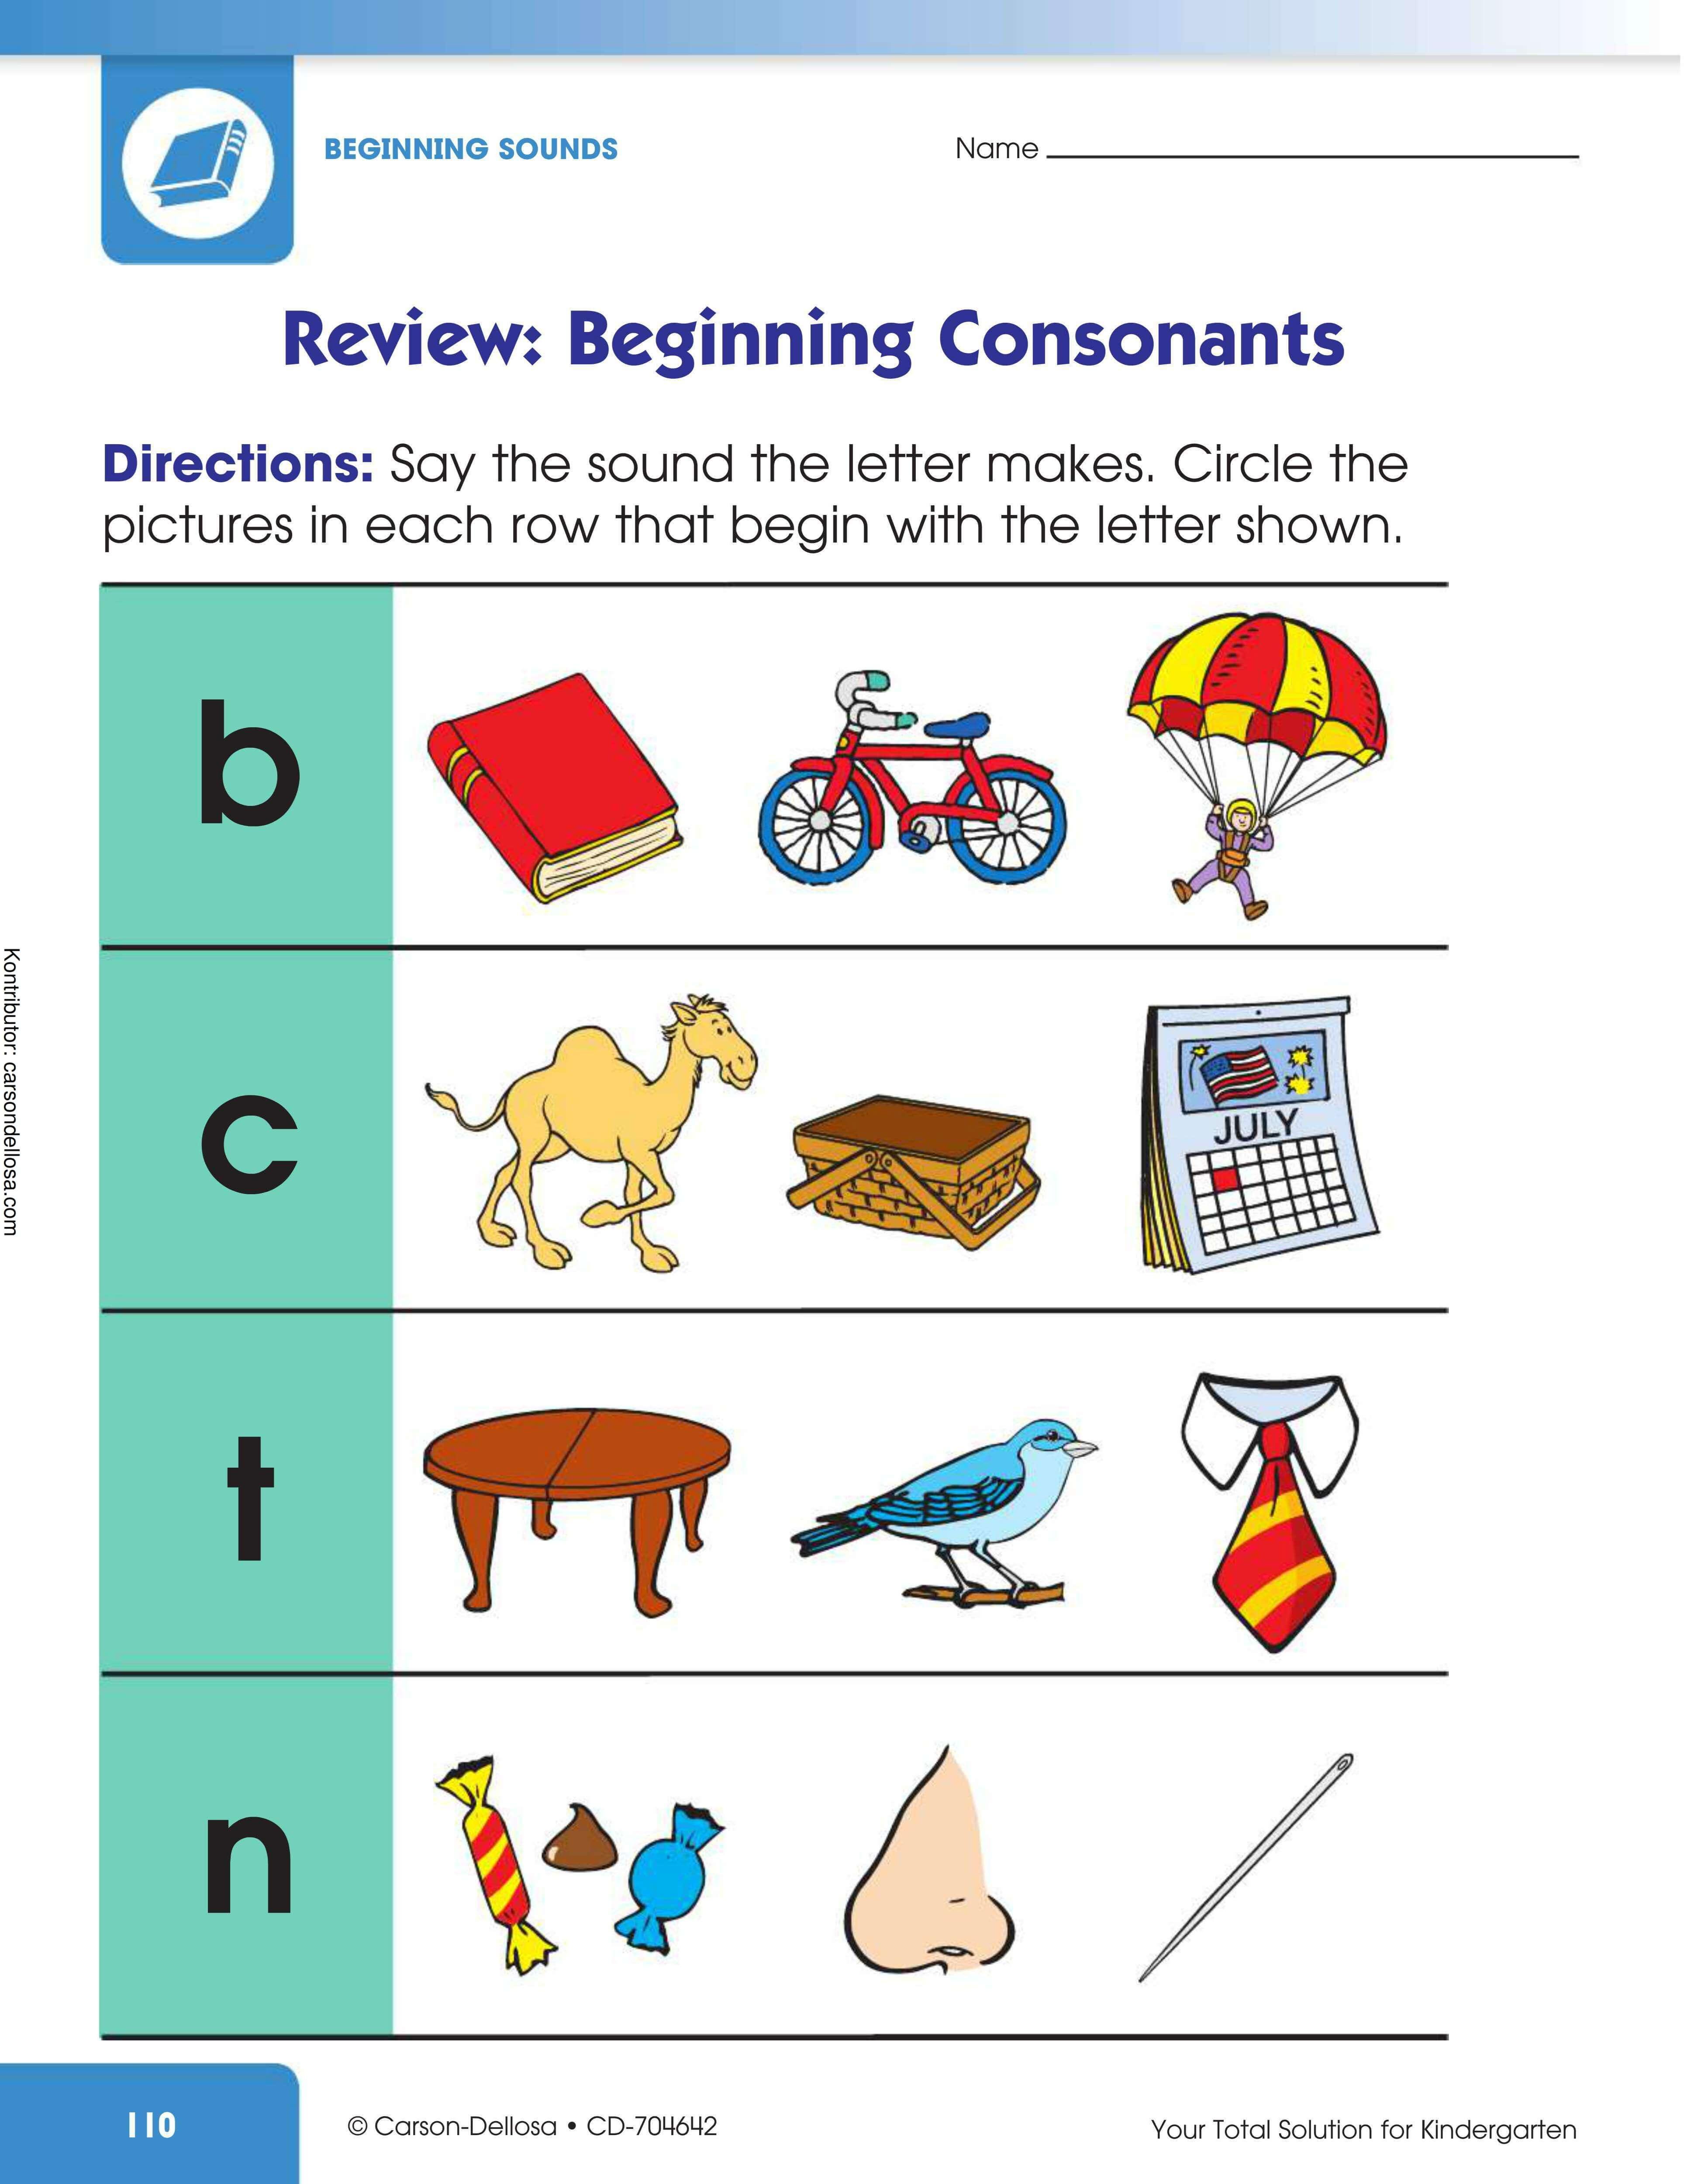 Belajar Mengenal Gambar yang Berawalan Huruf Konsonan (4)